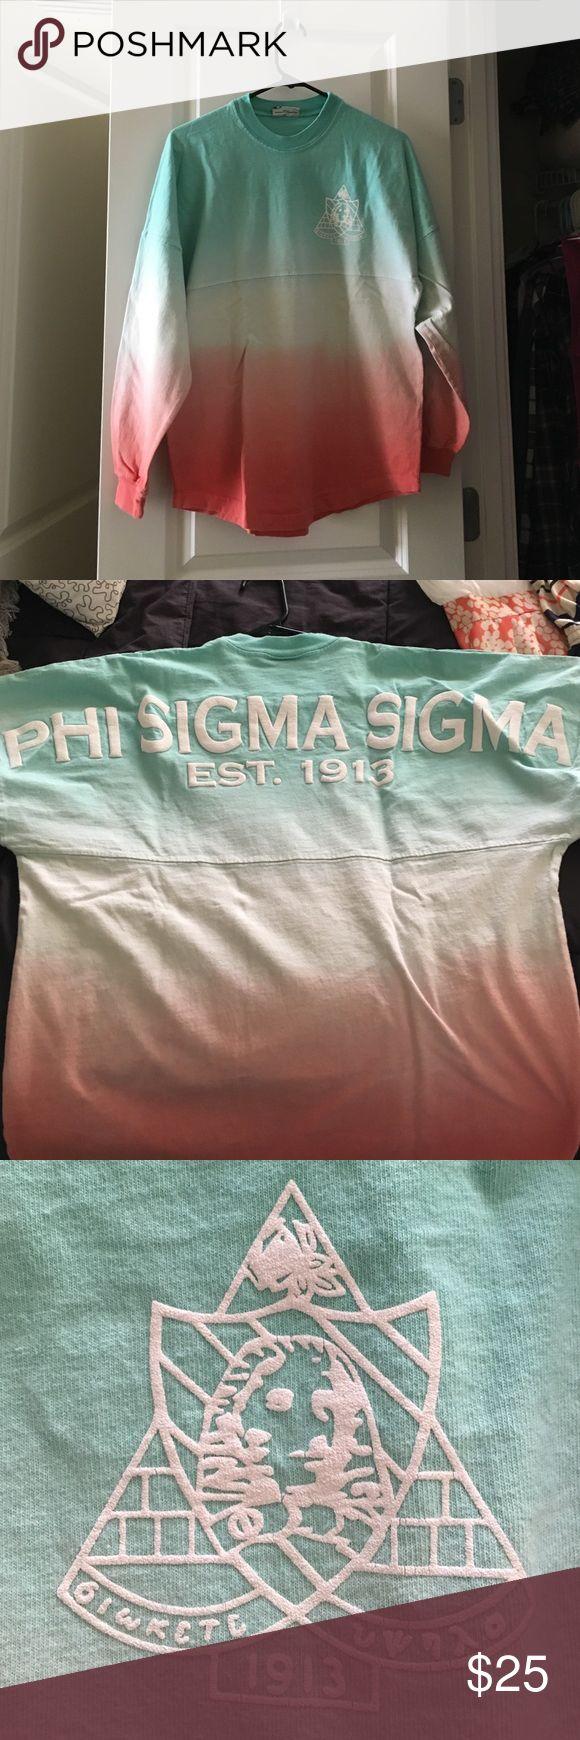 Phi Sigma Sigma Spirit Jersey Spirit jersey for Phi Sigma Sigma Sorority - teal and pink Spirit Jersey Sweaters Crew & Scoop Necks